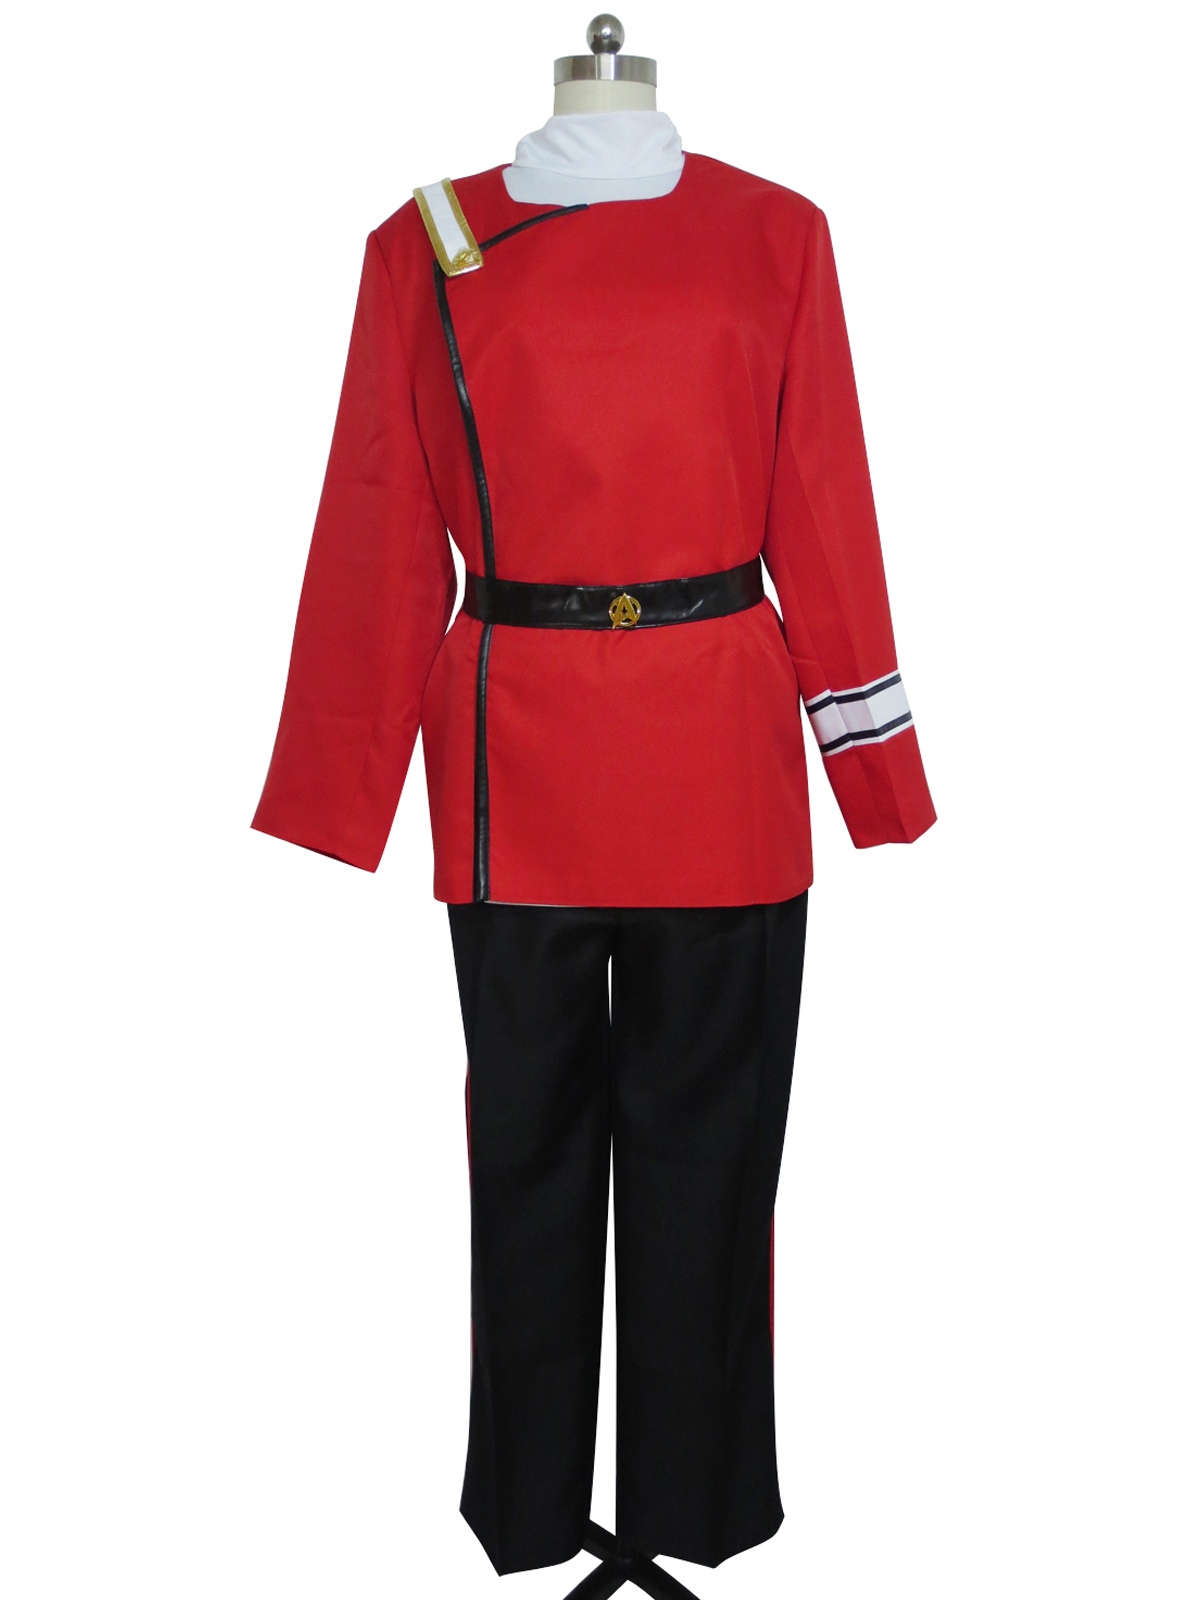 Star Trek Enterprise Starfleet Archer Duty Uniform Cosplay Costume custom made